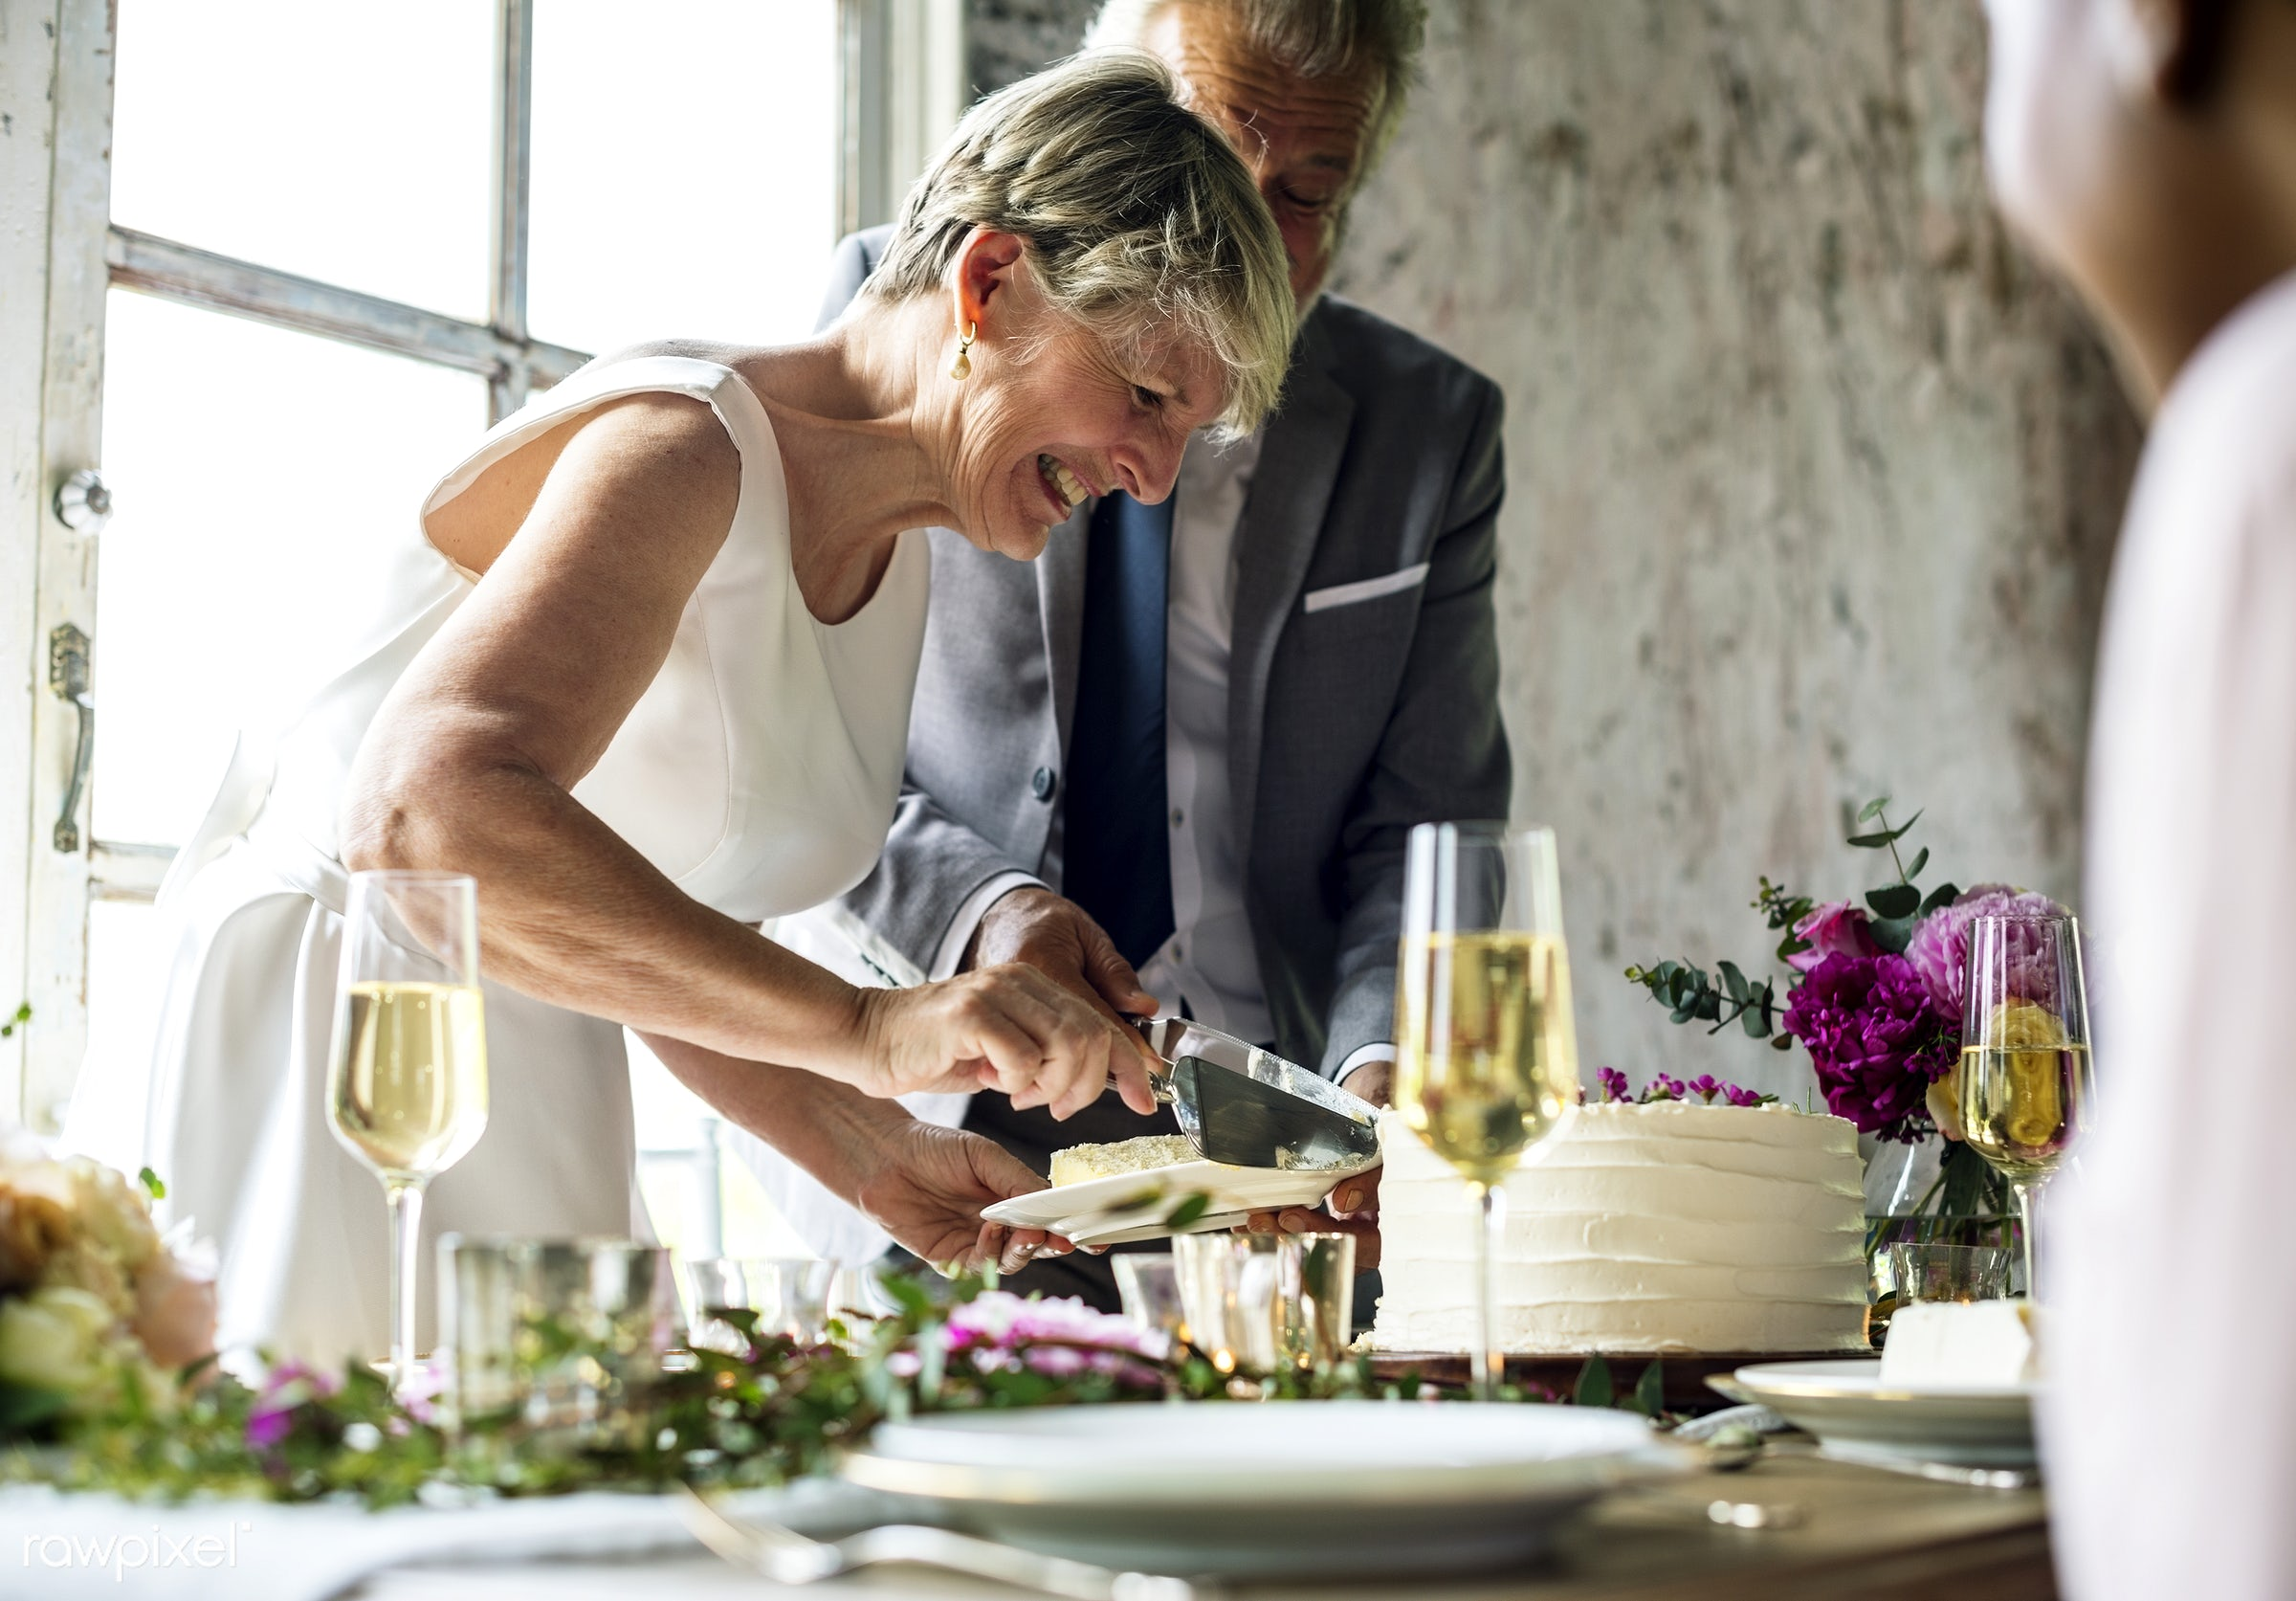 Bridge and groom wedding day - bride, cake, celebration, couple, dessert, dining, eating, elderly, even, food, groom, love,...